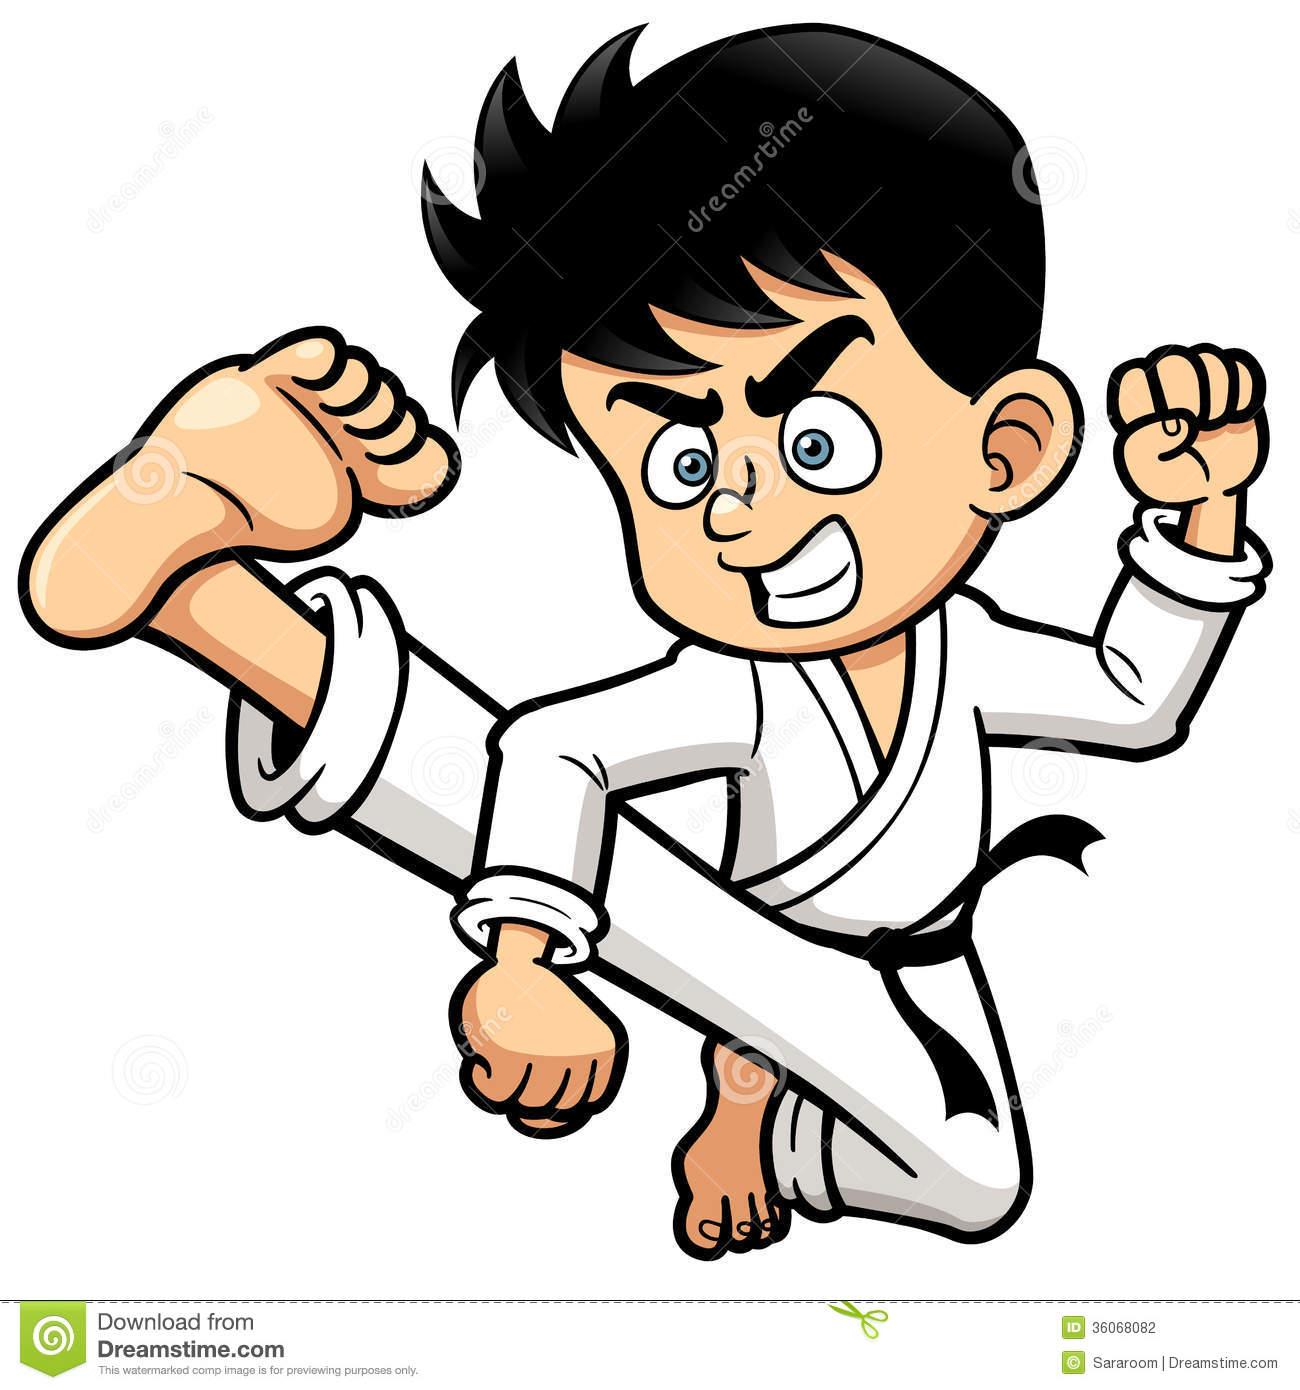 karate kick clipart clipart panda free clipart images taekwondo clip art real taekwondo clip art black